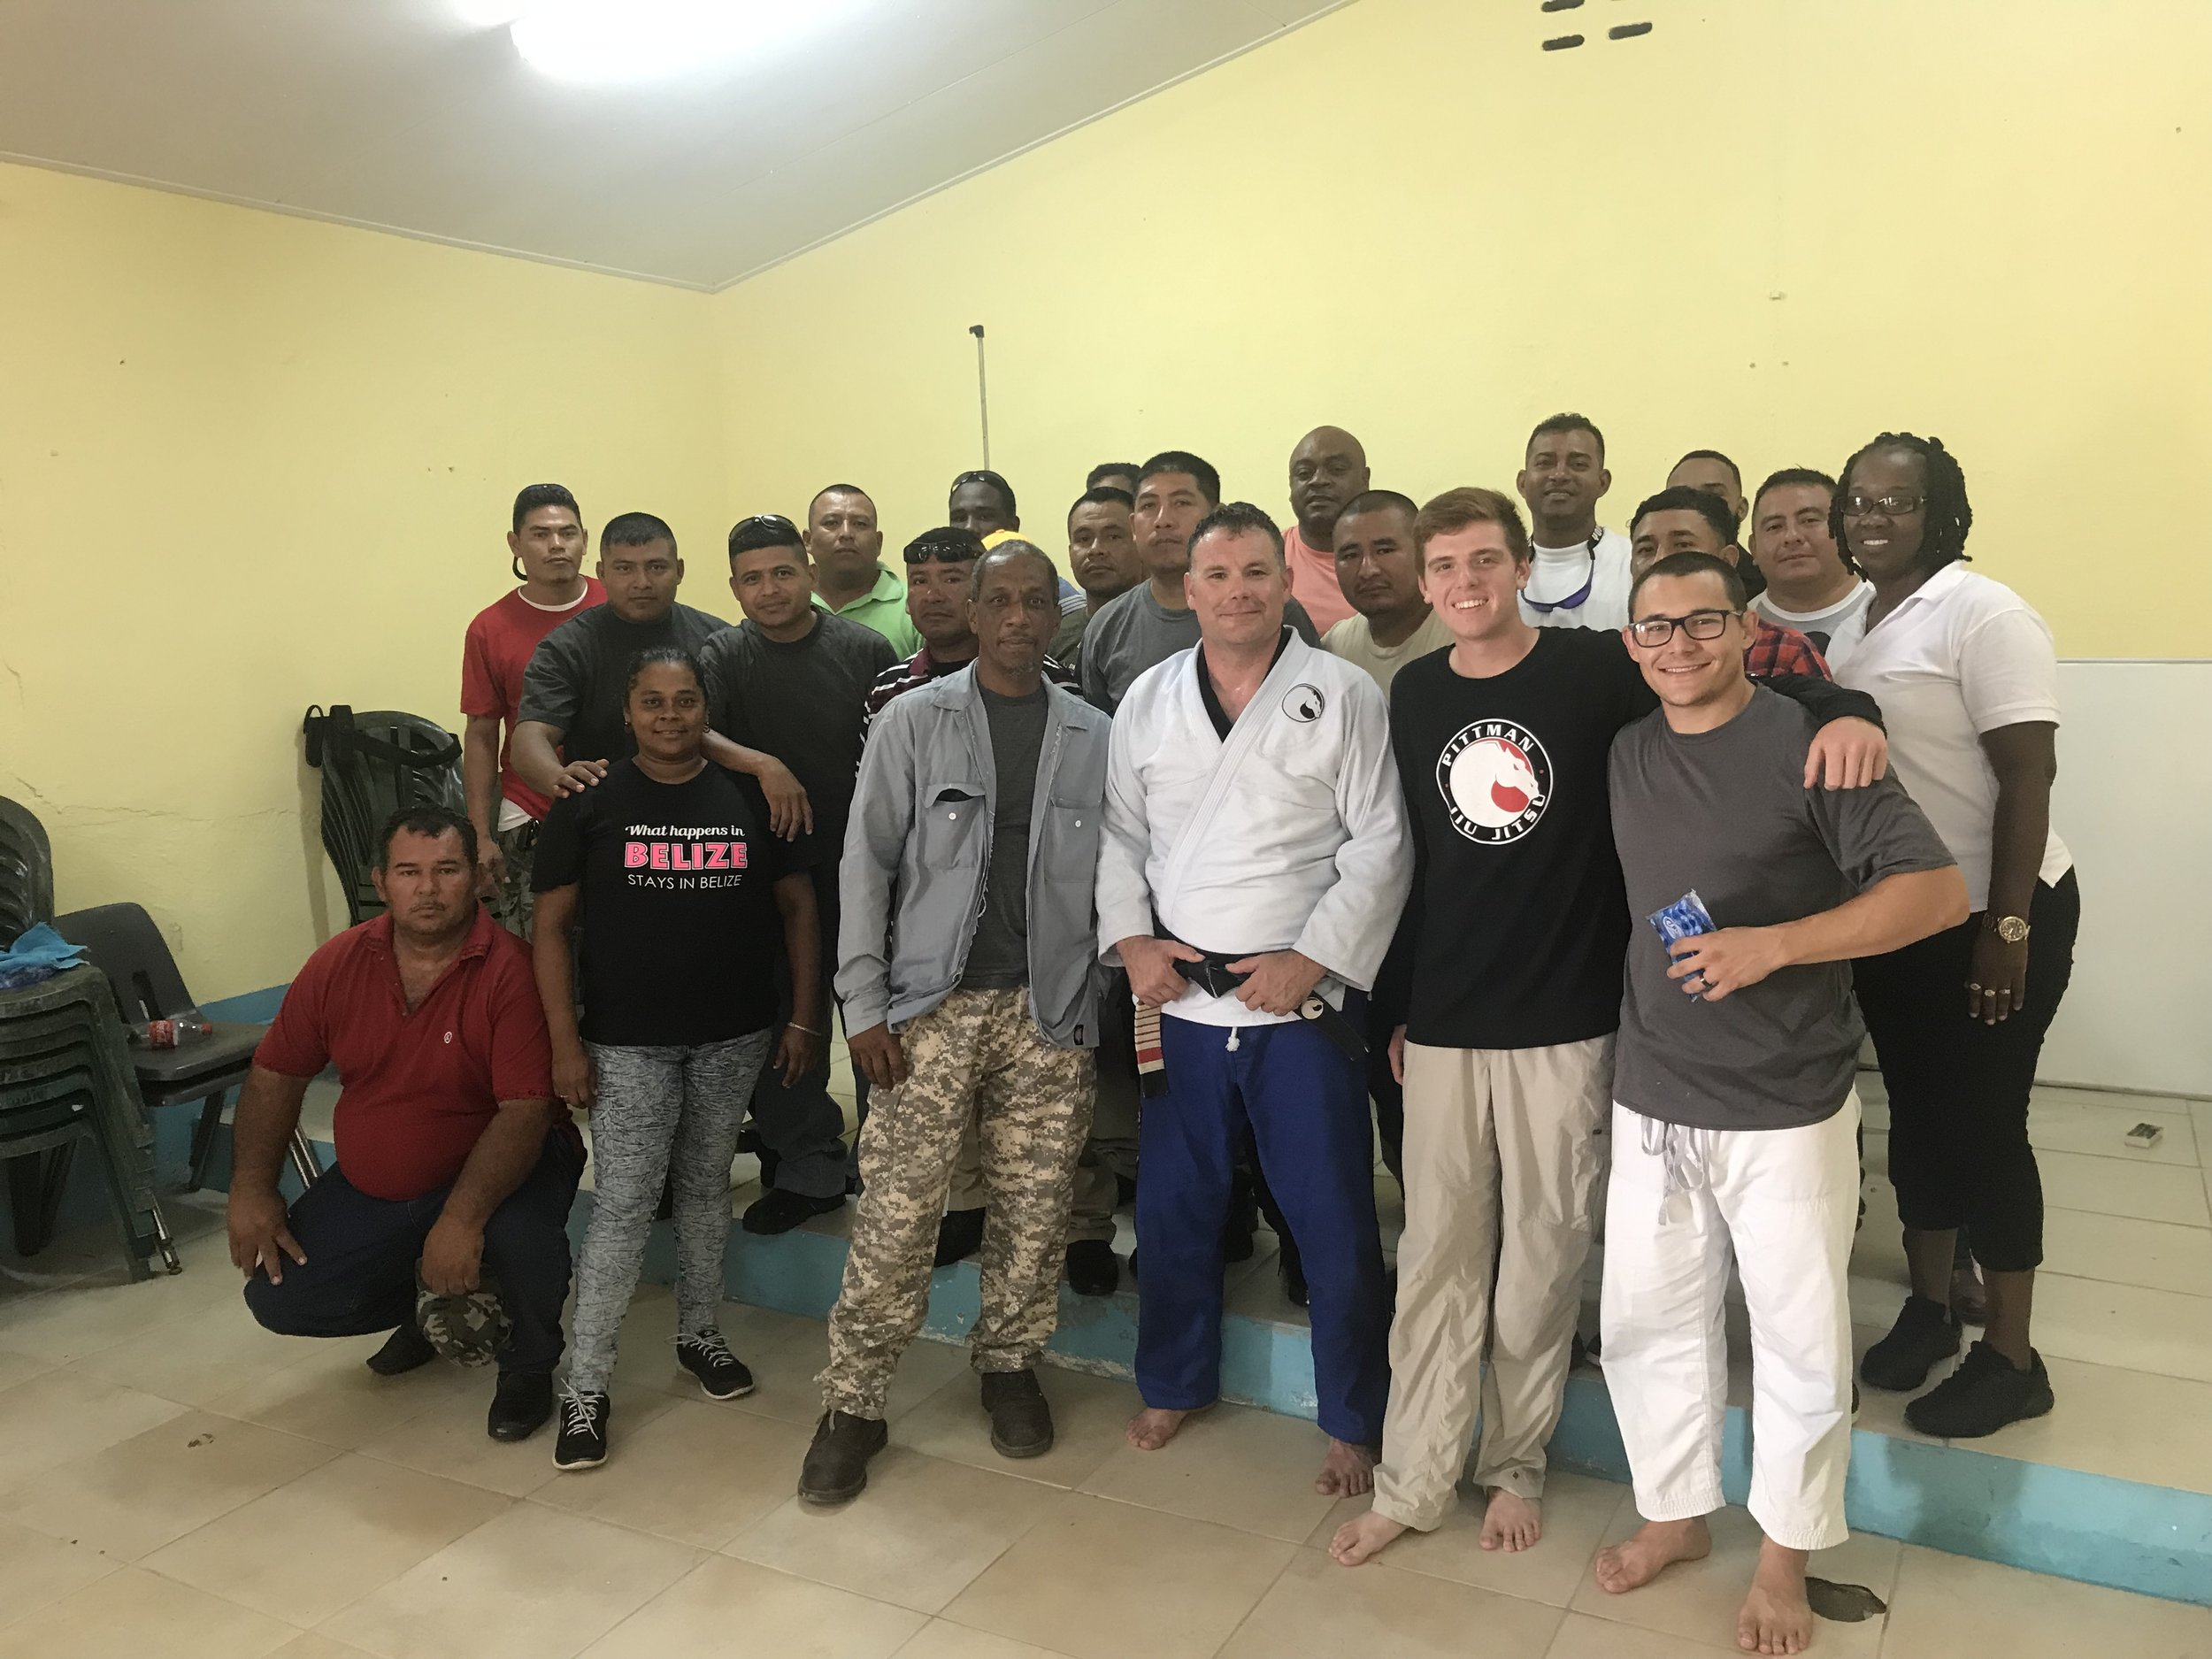 Jiu-jitsu training in Belize Prison